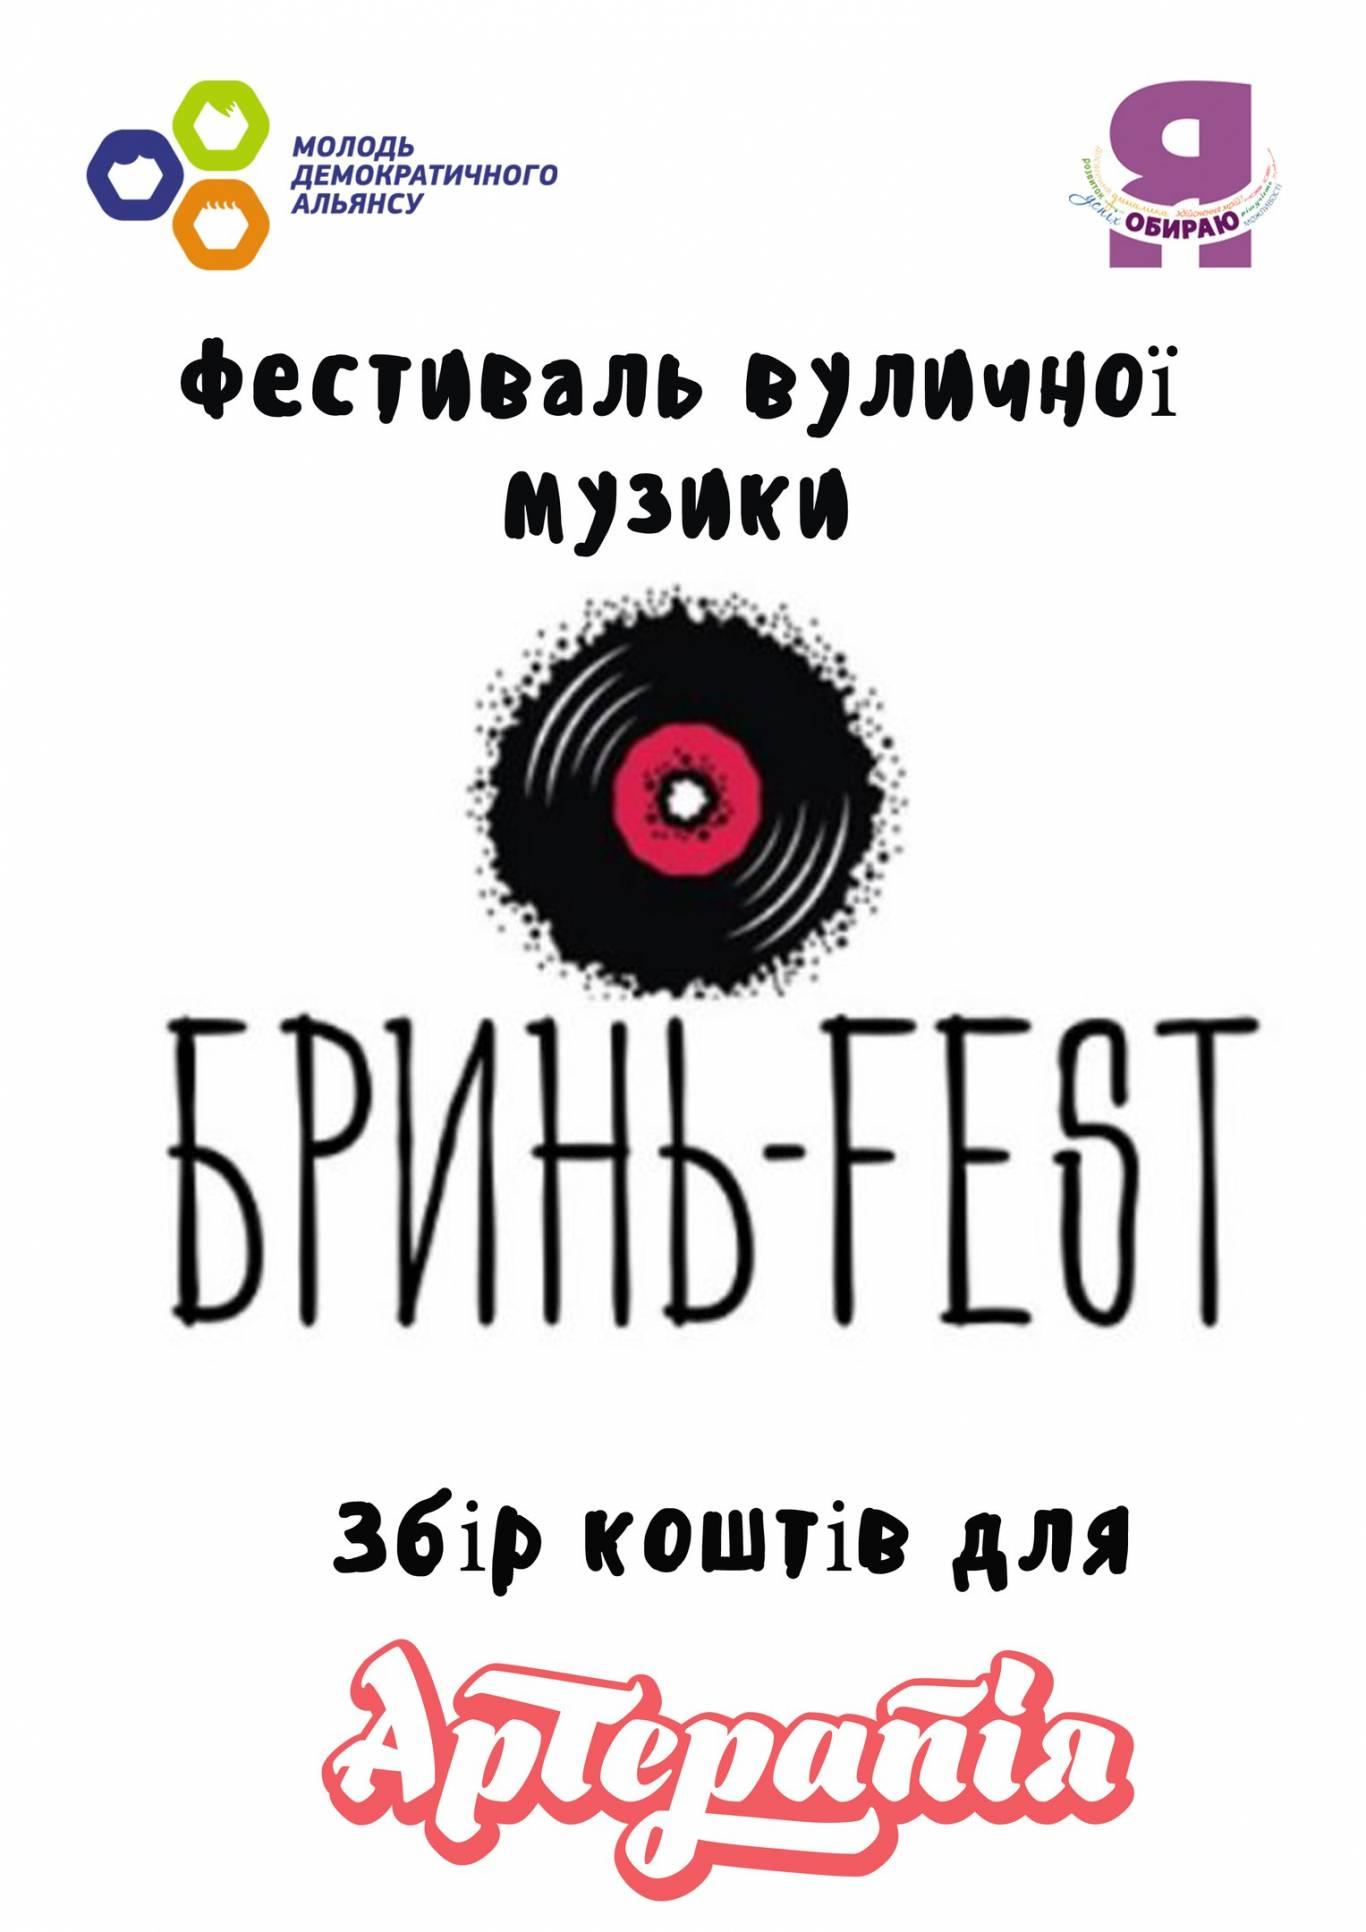 Бринь-fest || м.Житомир